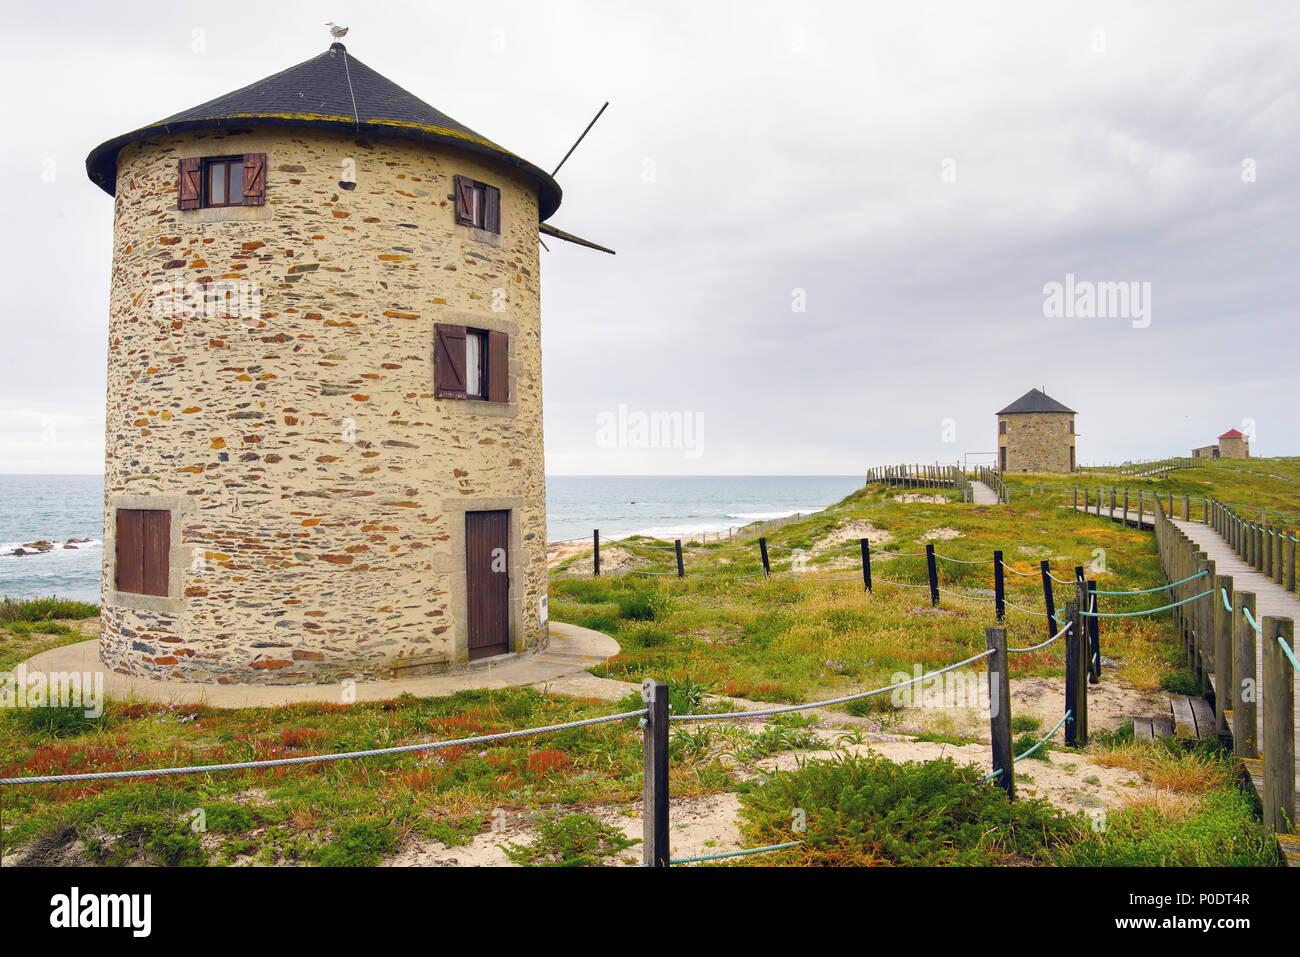 Windmills by the coastal path at beach Praia da Apúlia, Portugal. - Stock Image